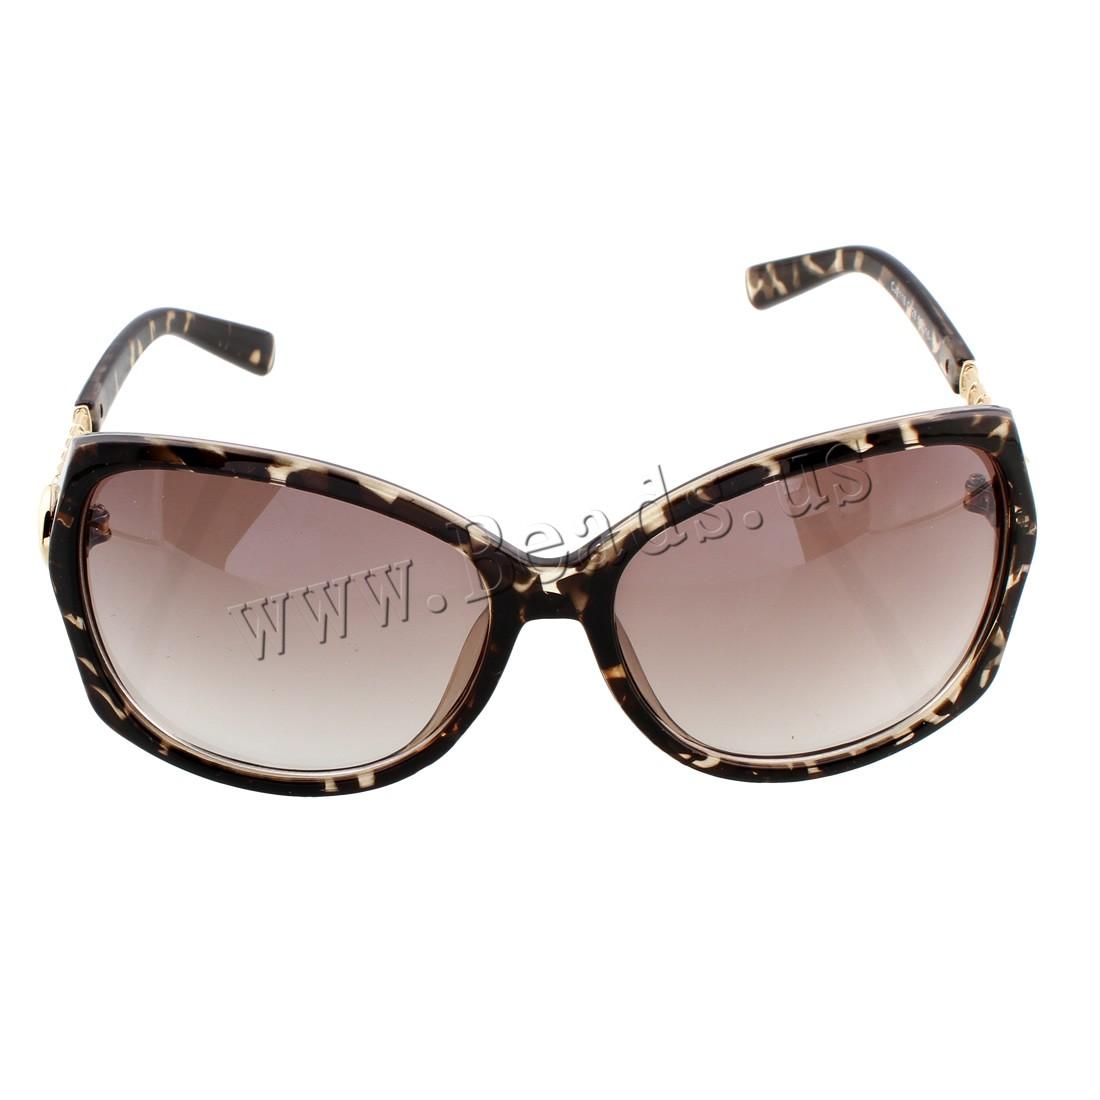 Buy Fashion Sunglasses Resin PC plastic lens anti ultraviolet & Unisex 140x50x135mm Sold PC